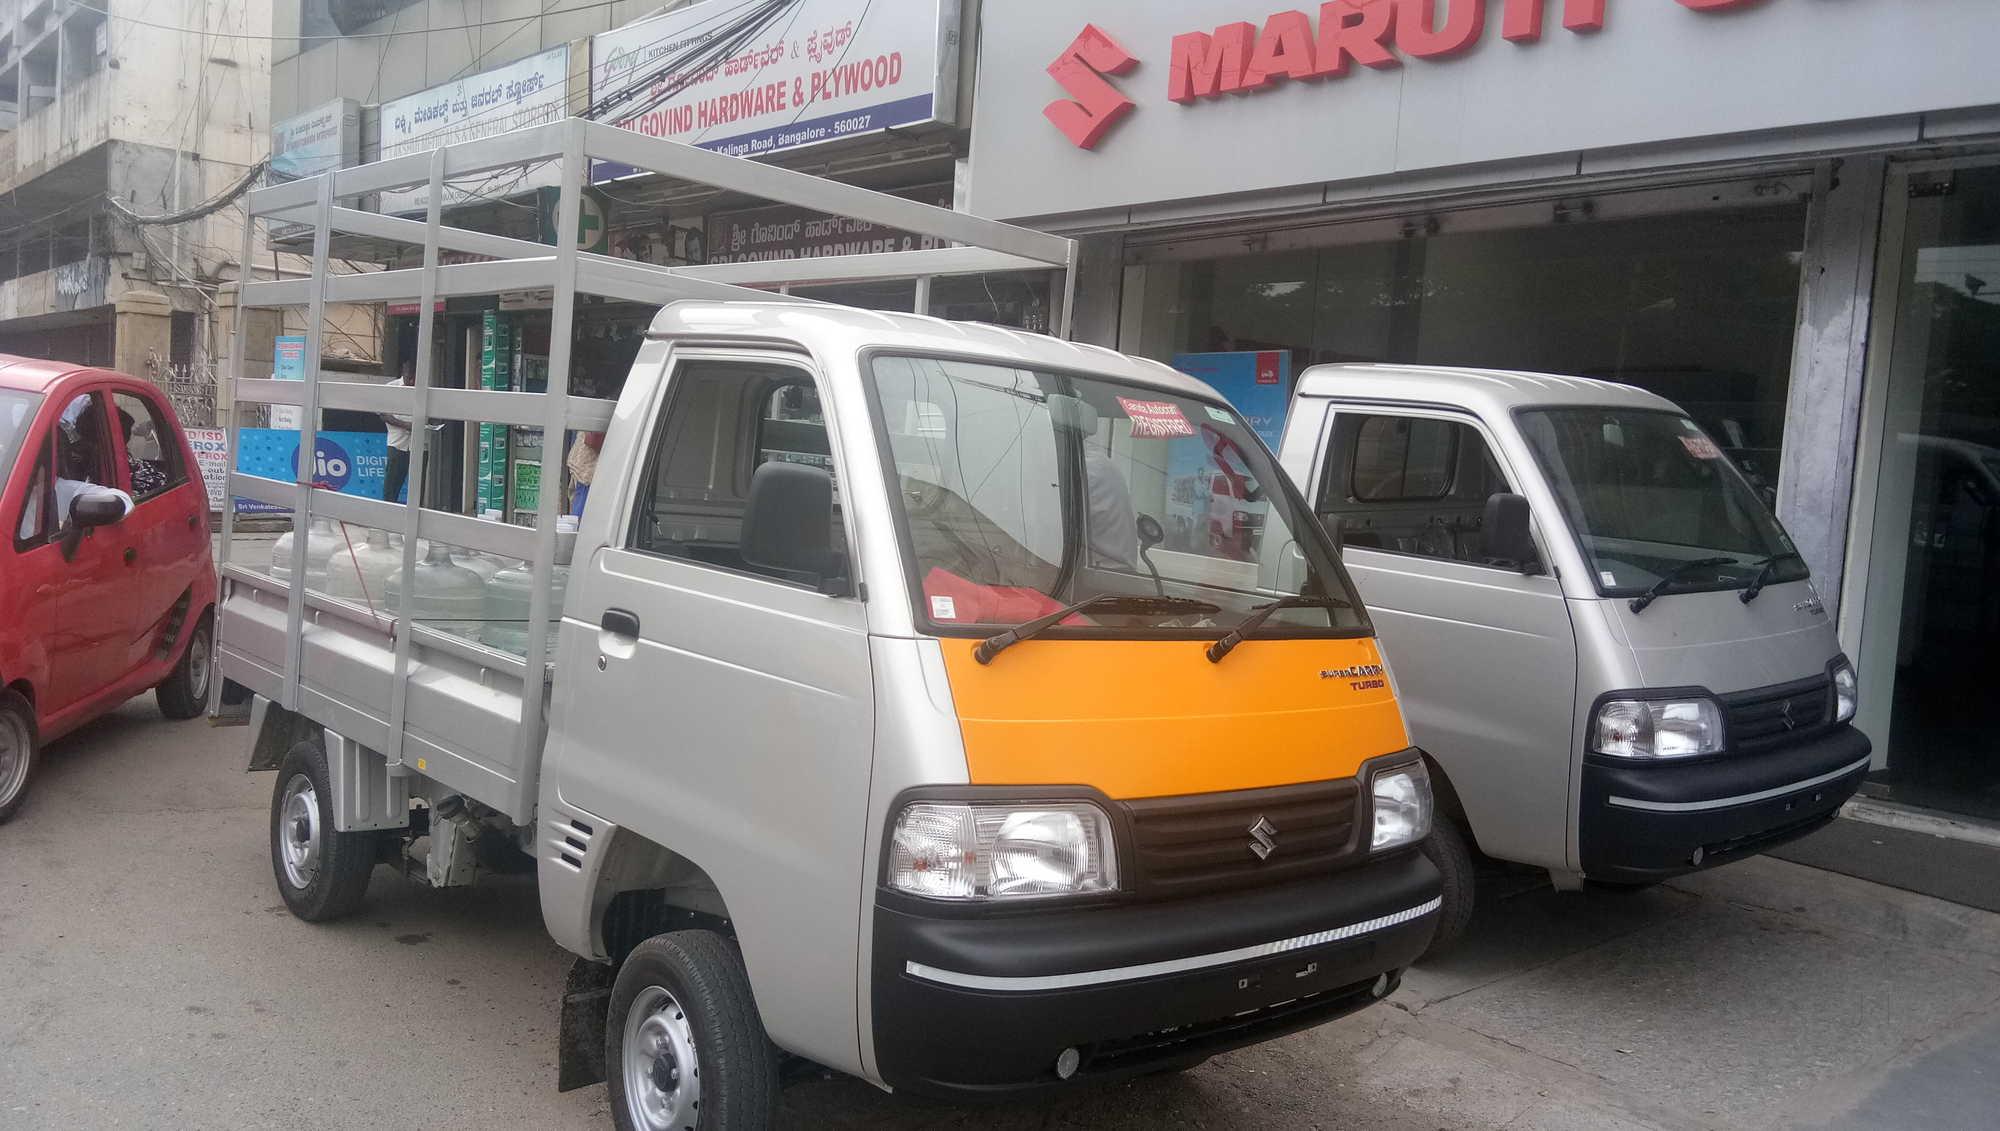 Maruti Suzuki Super Carry Mission Road Car Dealers Maruti Suzuki In Bangalore Justdial